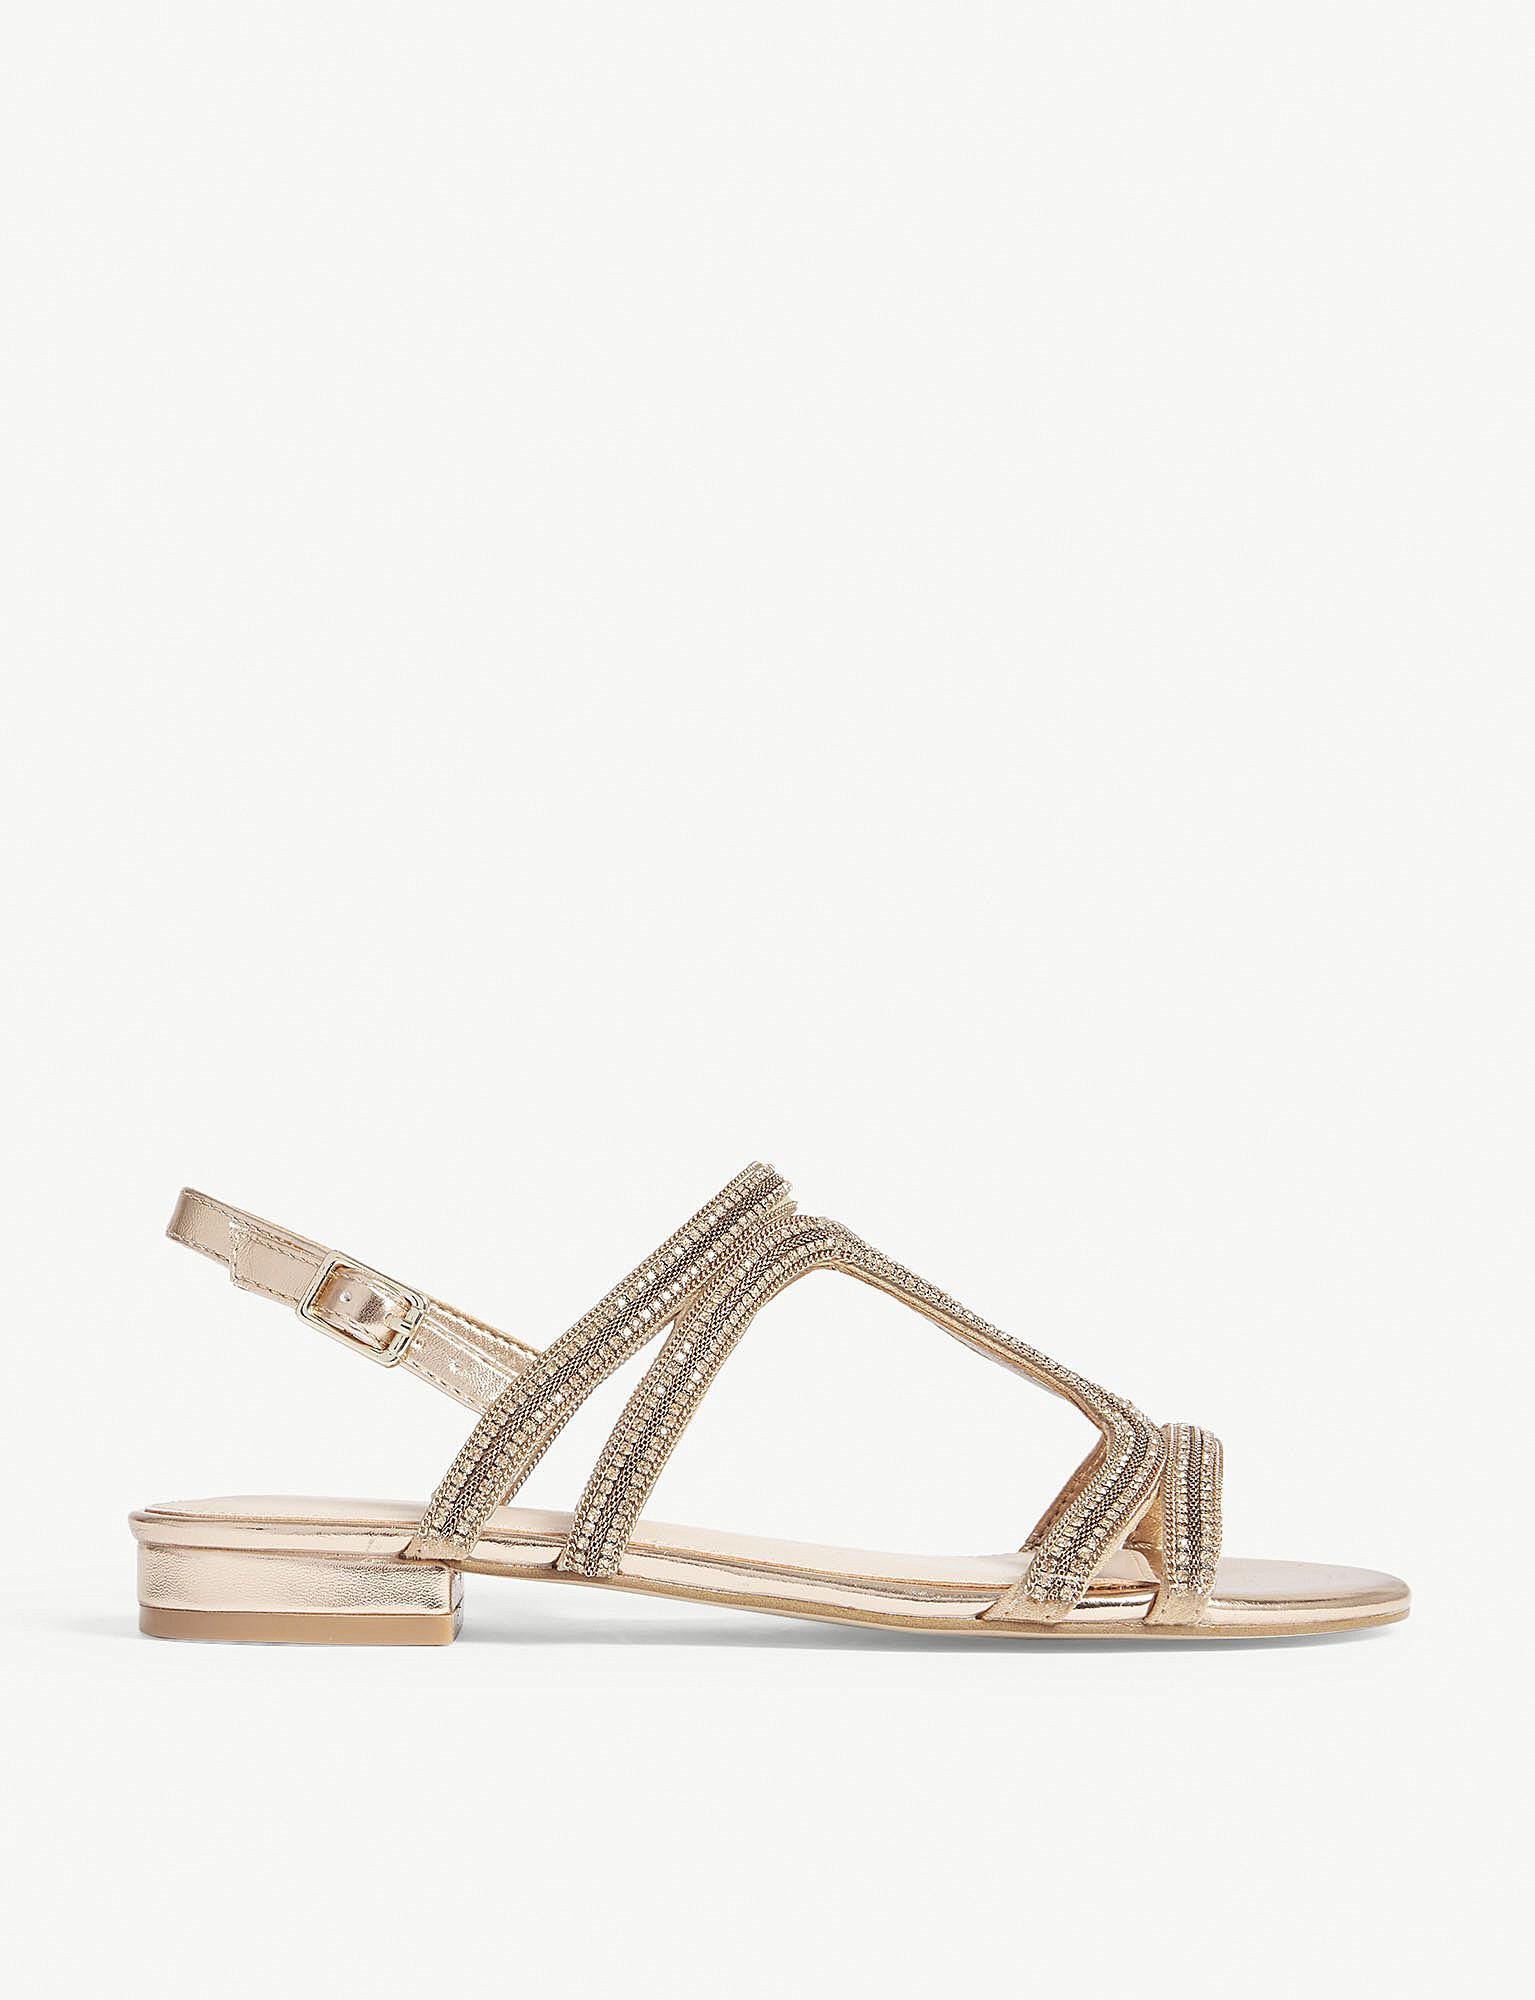 902250d49f15 Lyst - ALDO Asiliria Rhinestone Slingback Sandals in Metallic